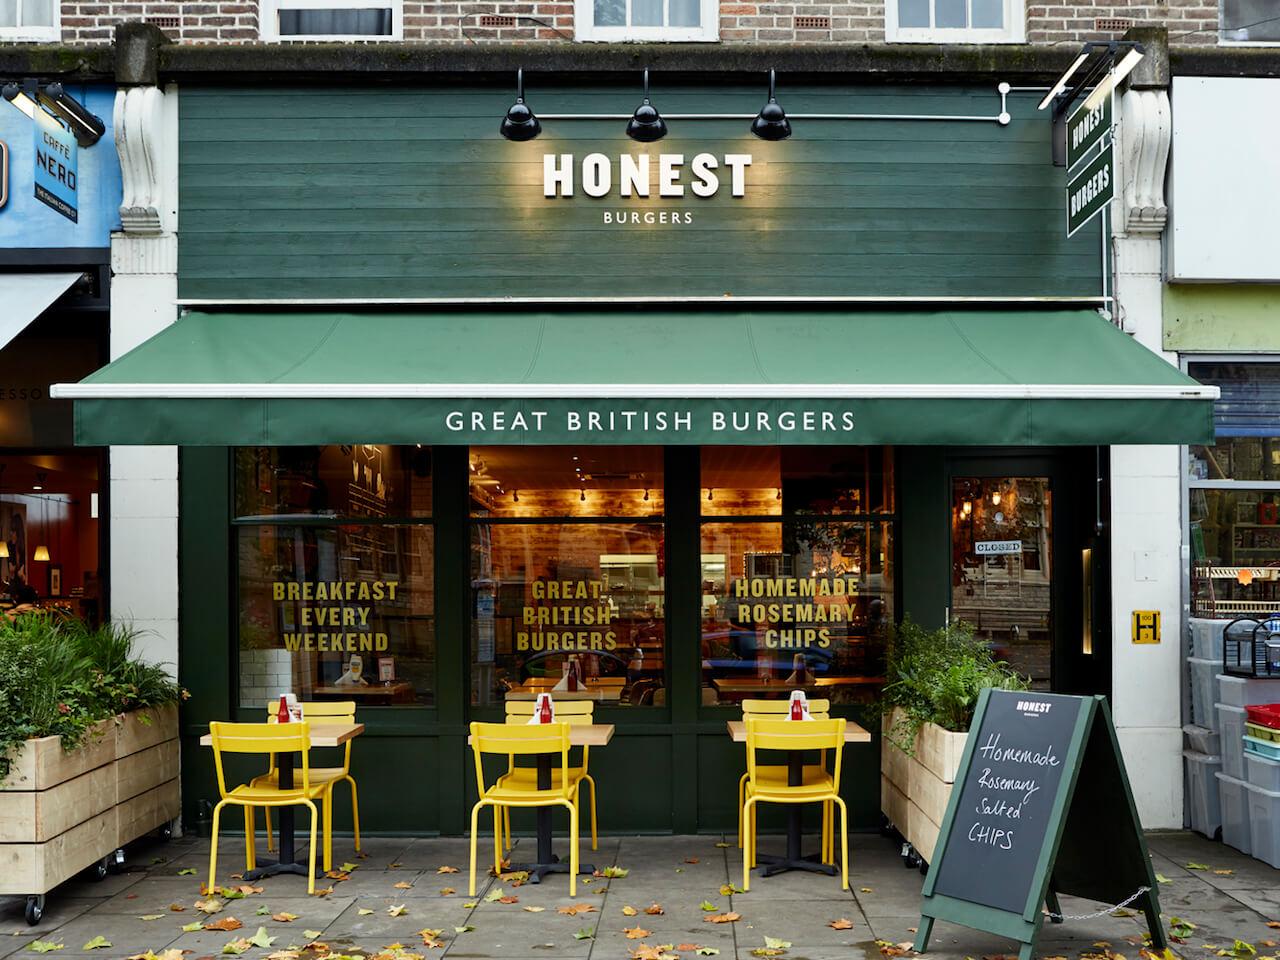 ealing-honest-burgers-restaurant-8